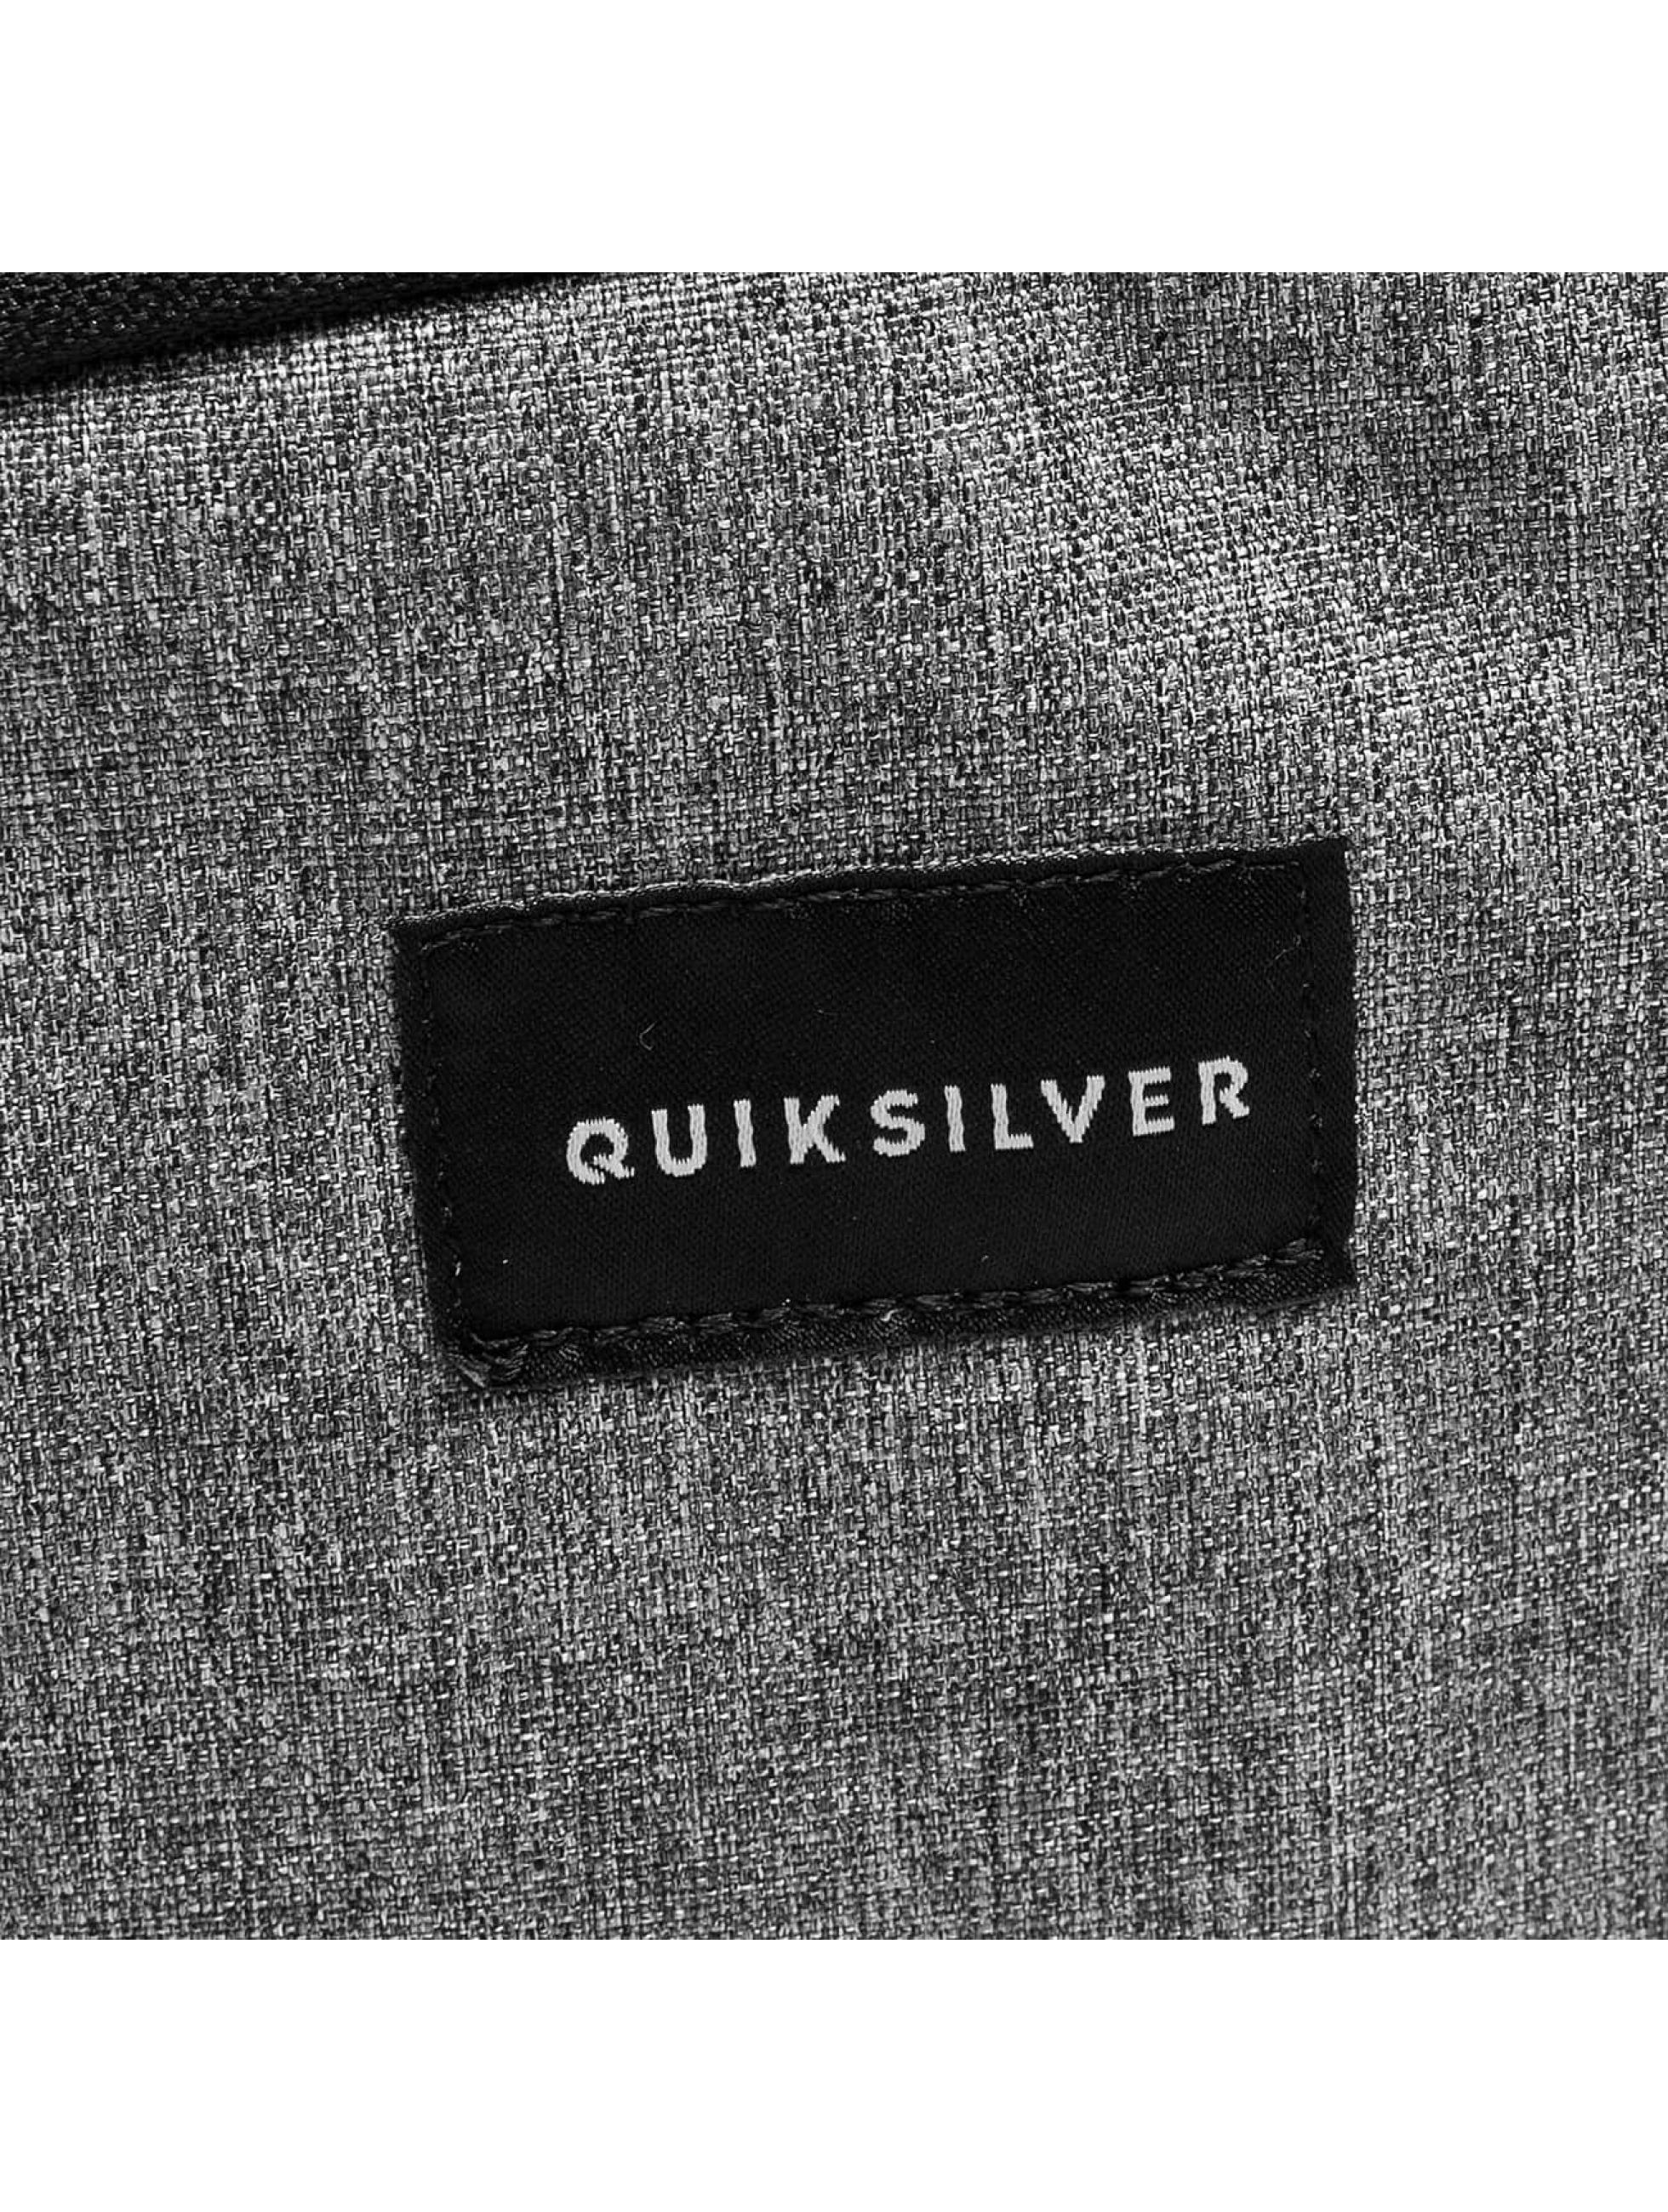 Quiksilver Rucksack 1969 Special grau